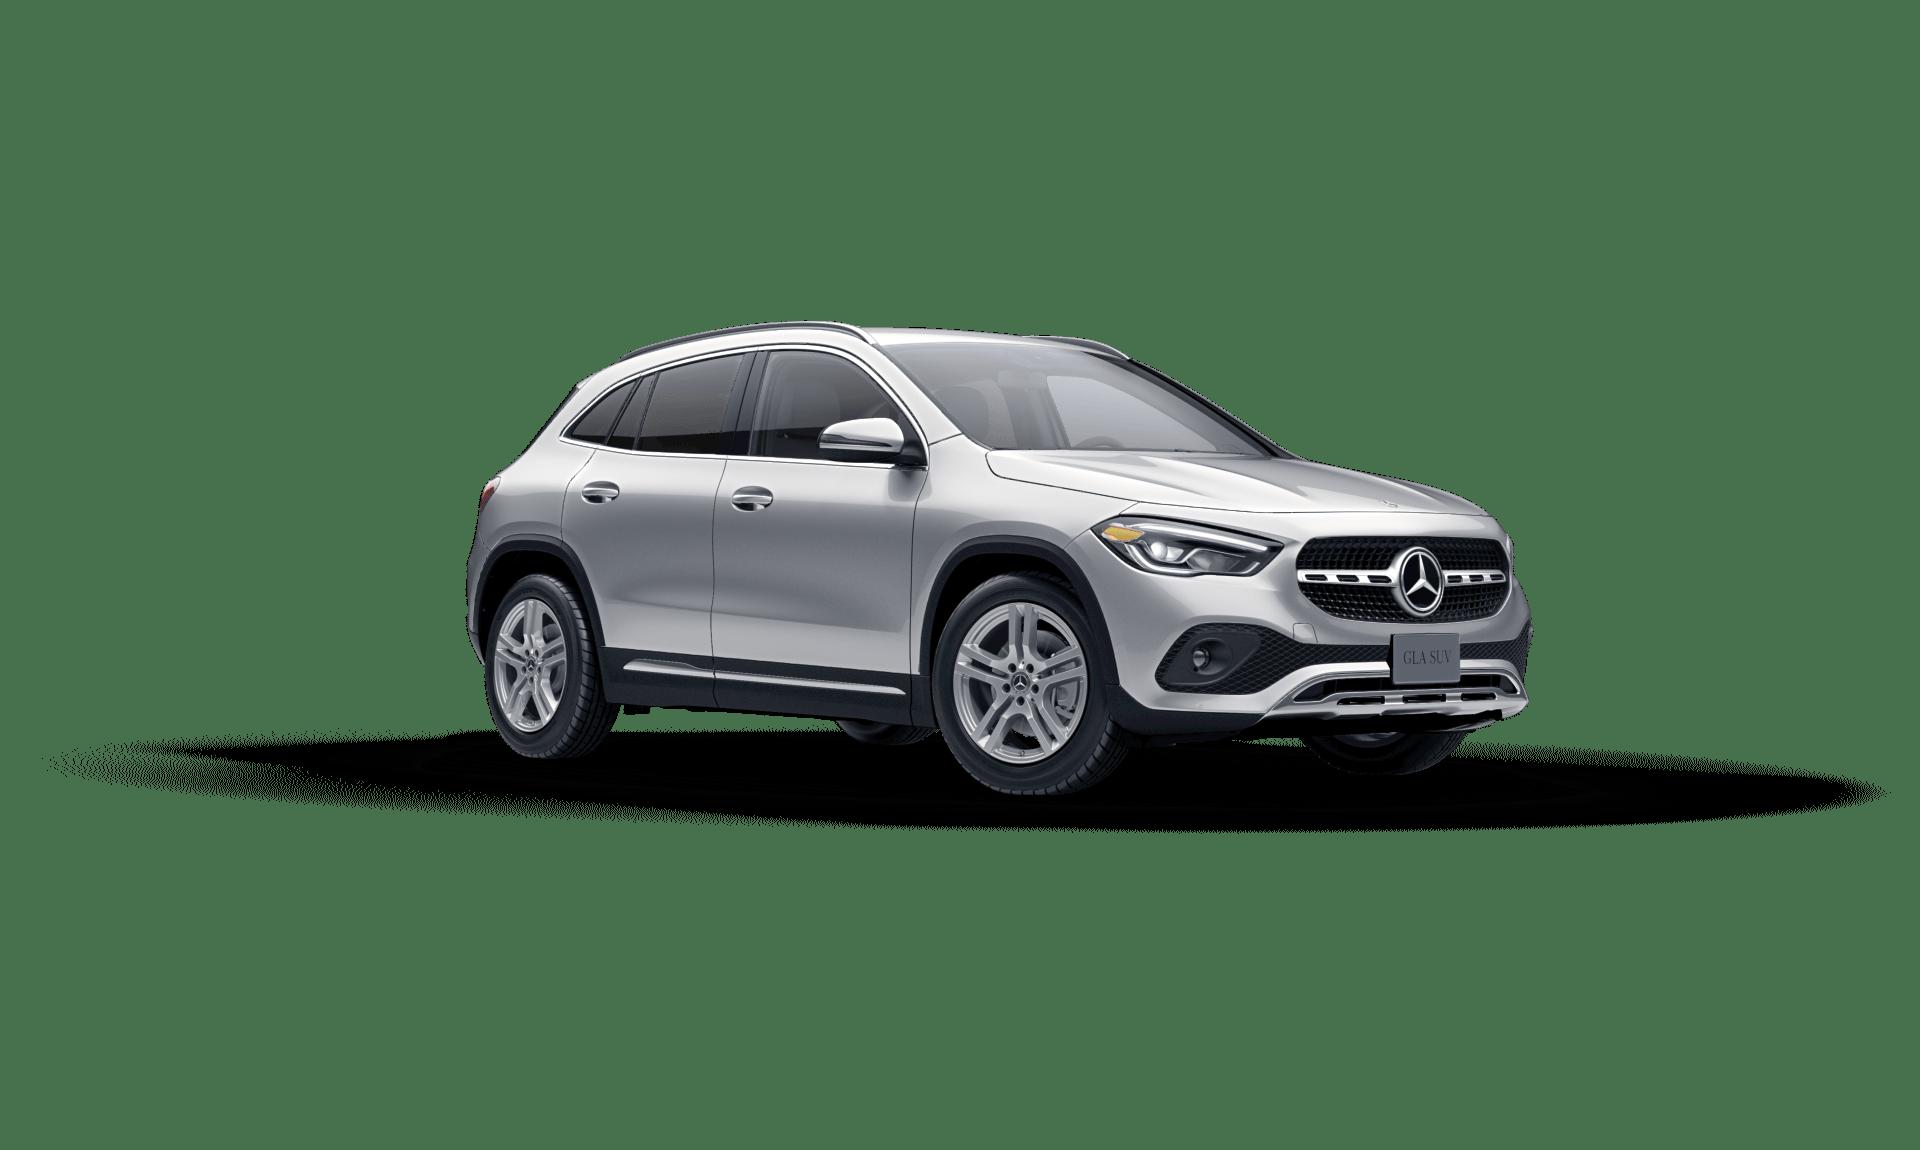 Mercedes-Benz GLA GLA 250 4MATIC® SUV